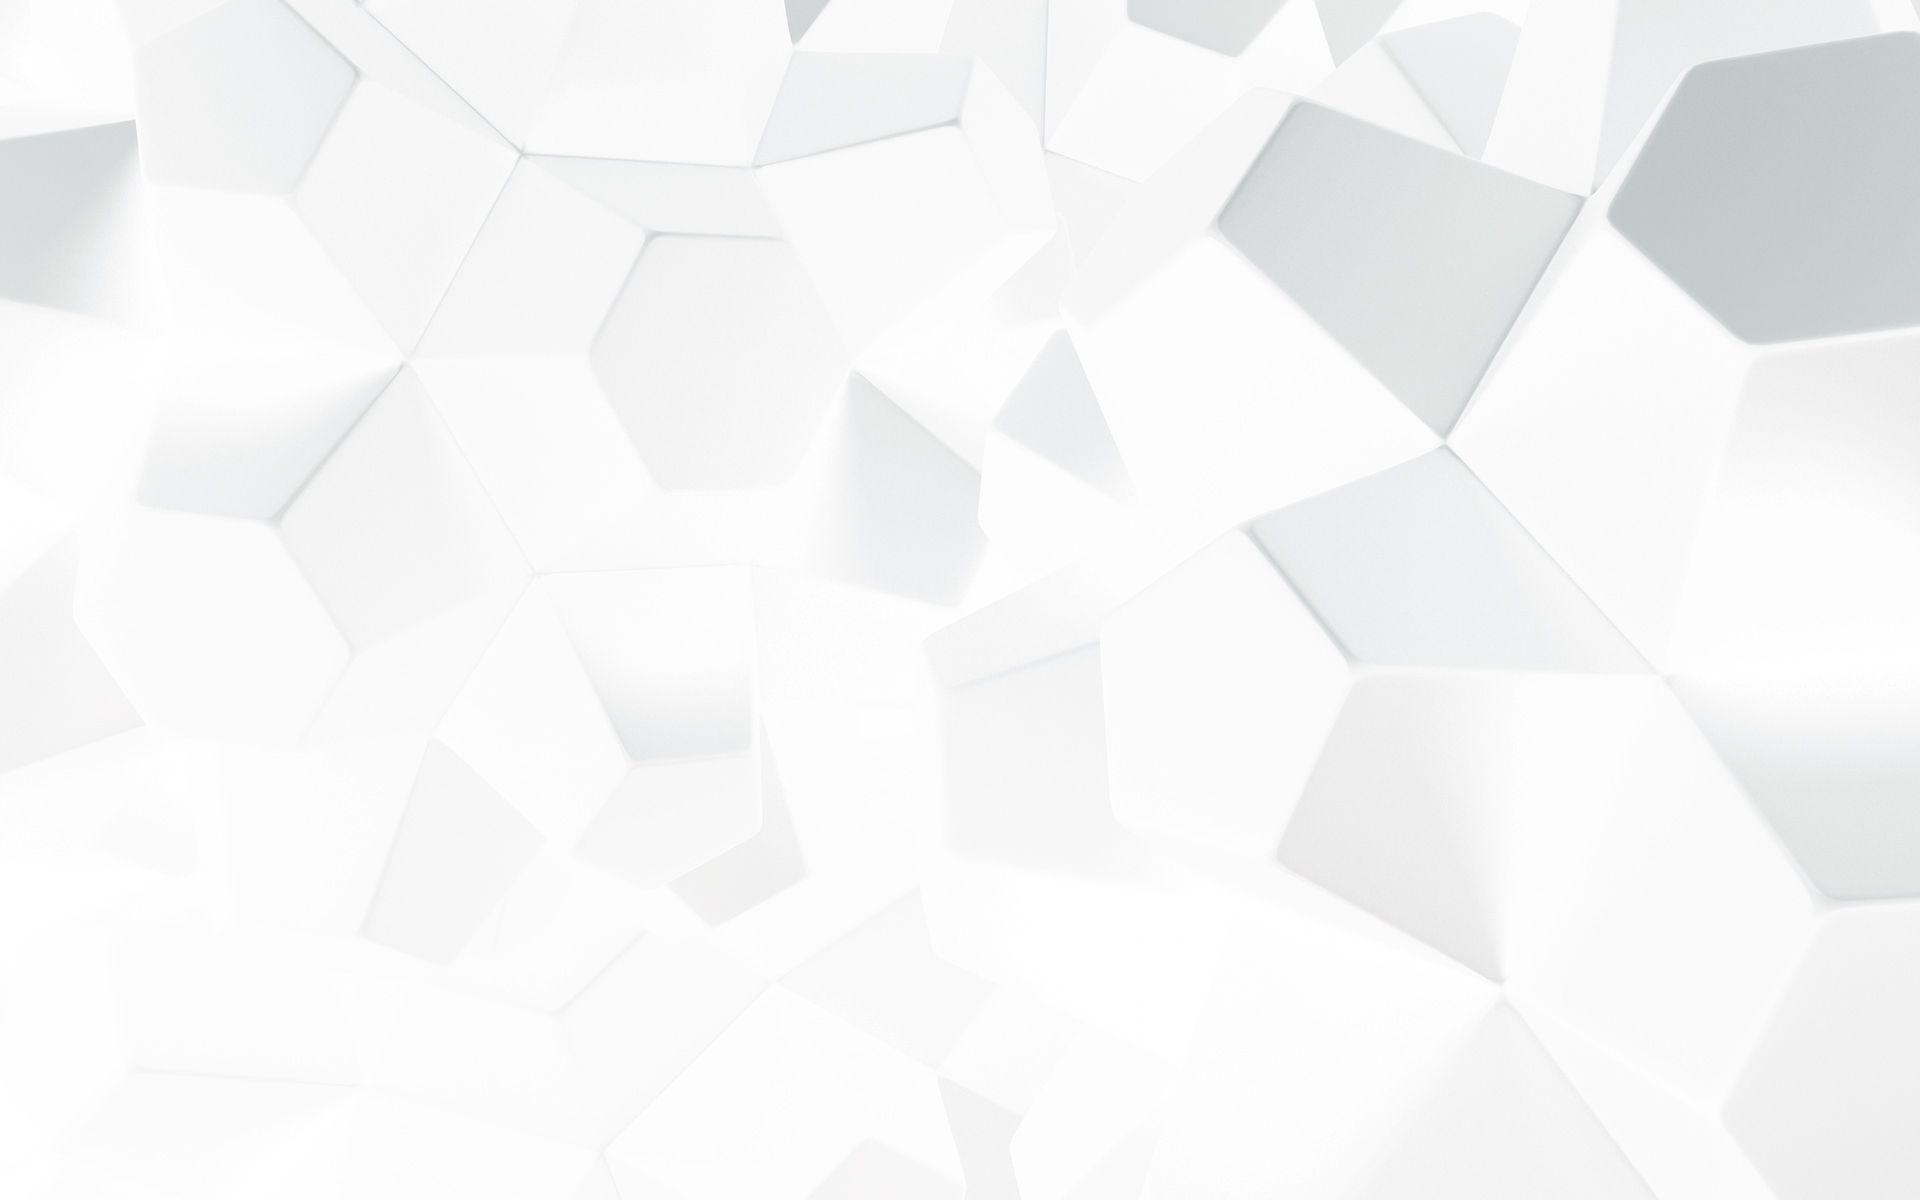 All White Background Bing Images All White ((̲̅ ̲̅